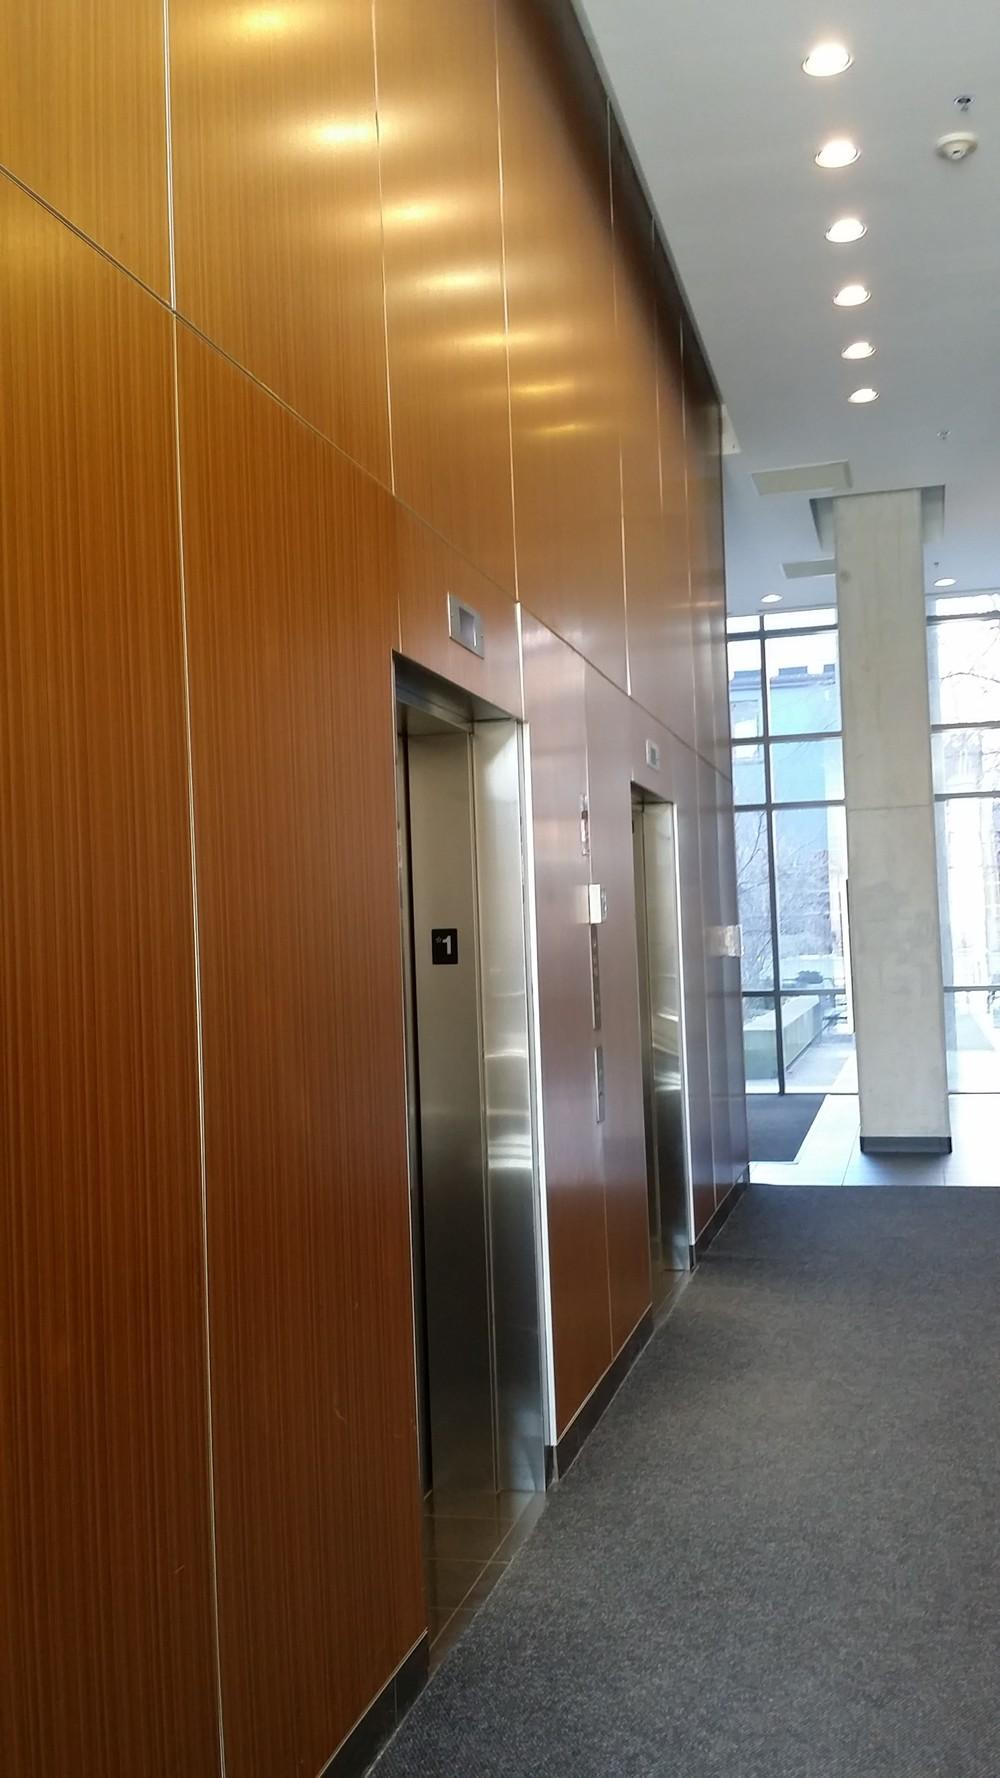 Existing Elevators